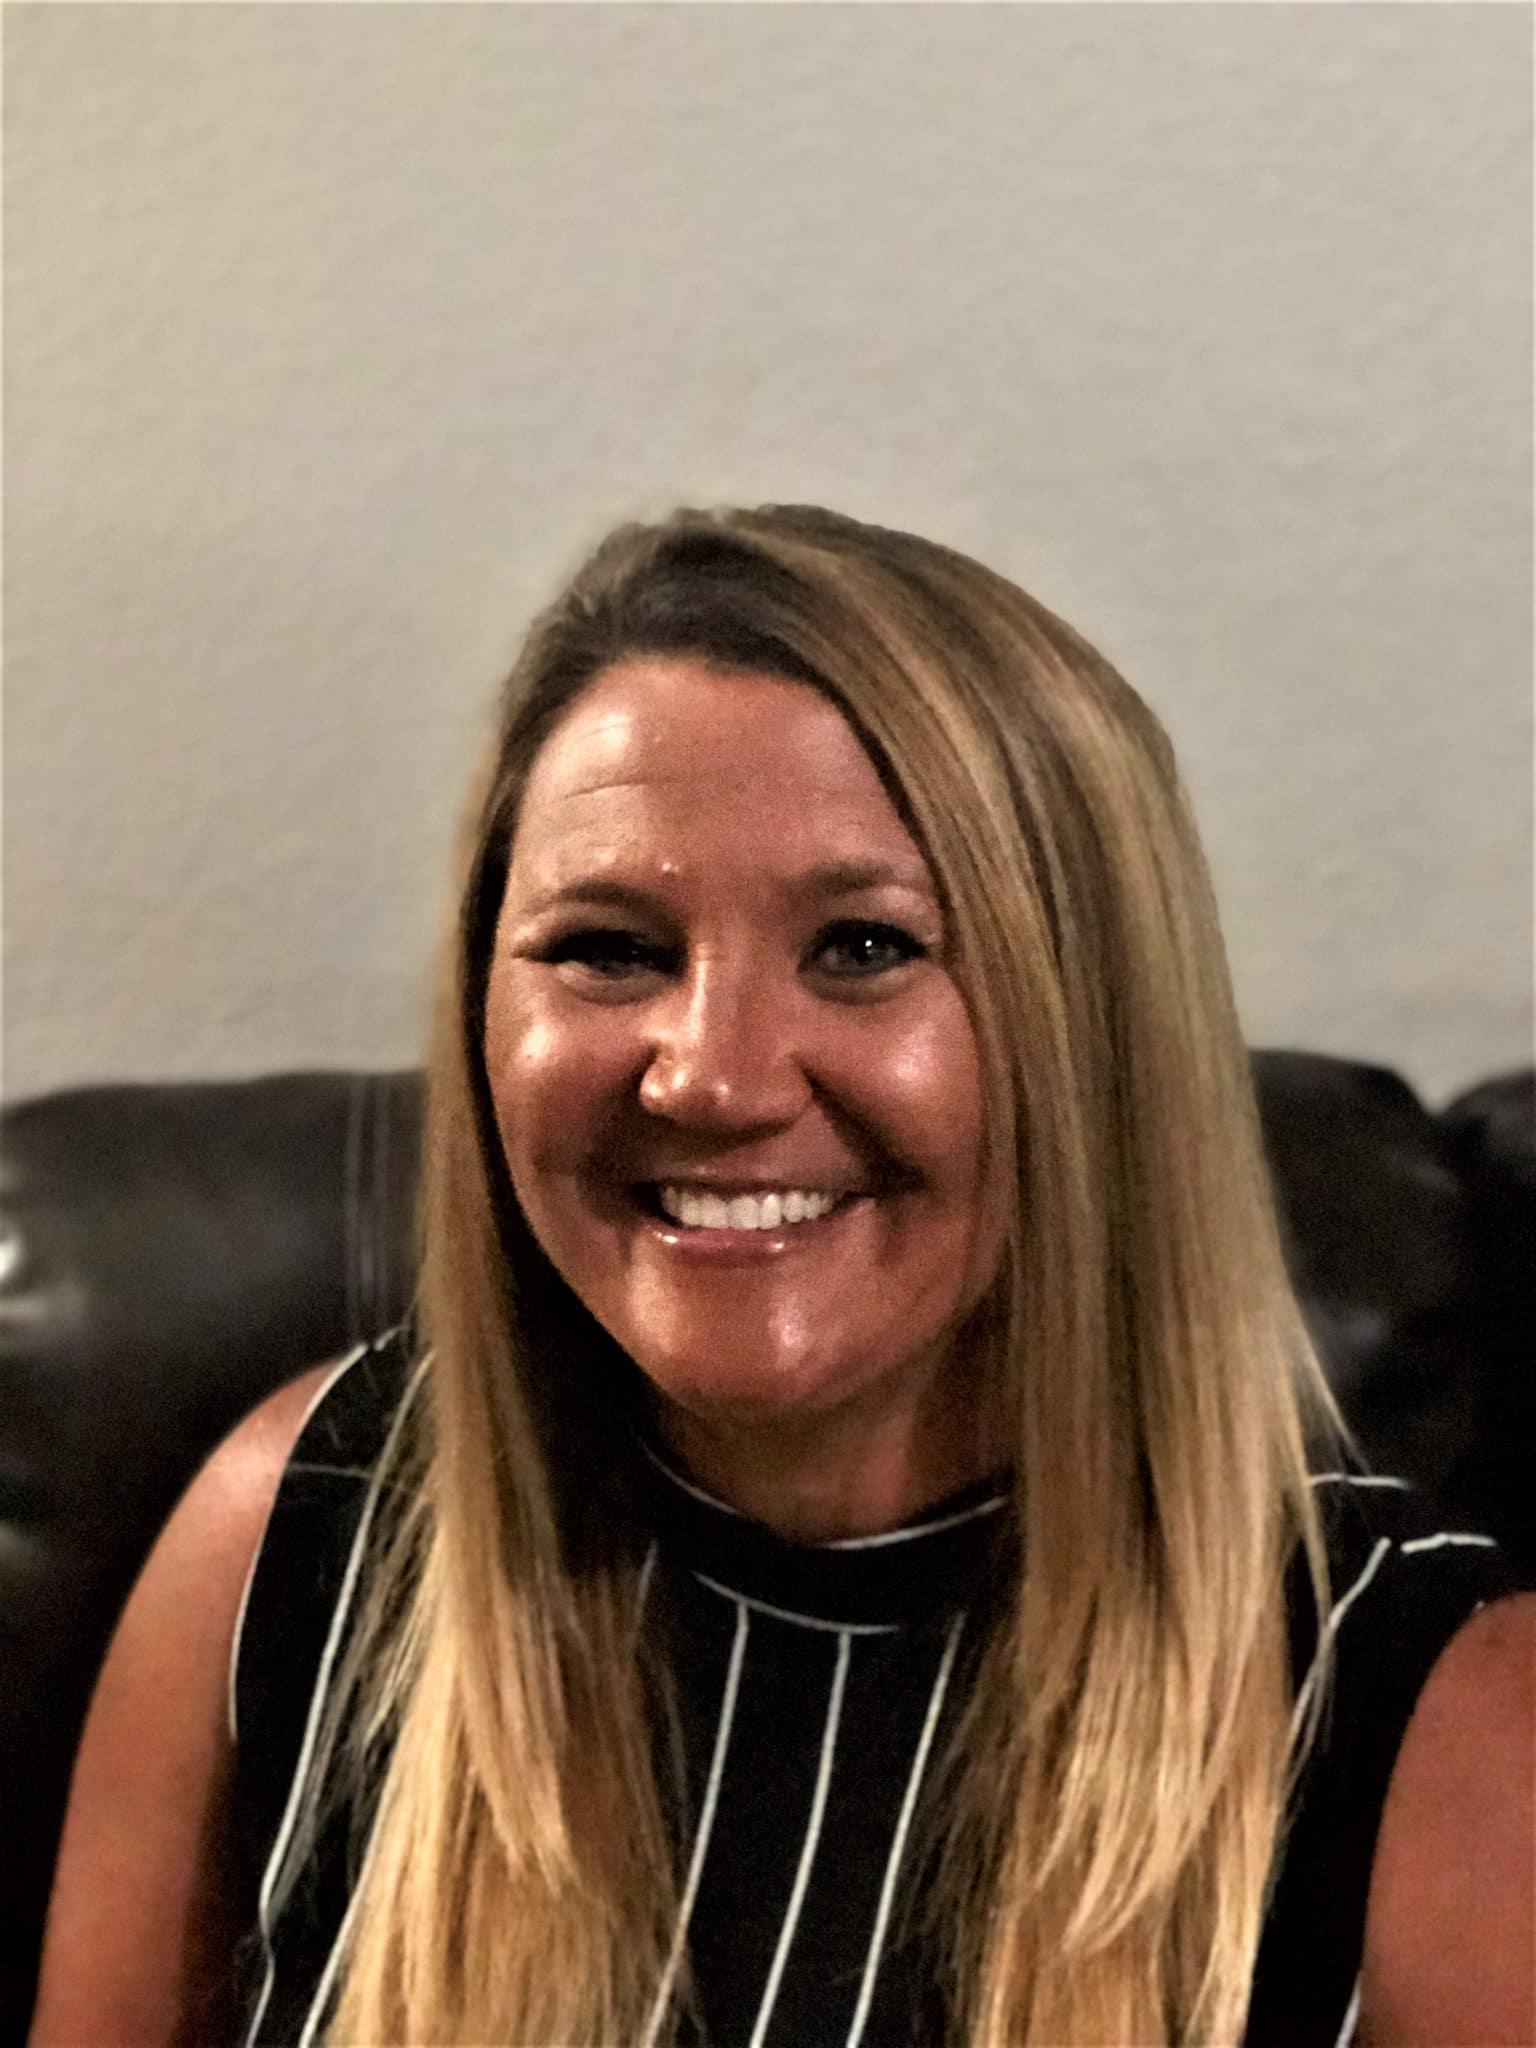 Shandee Burtis - Associate Executive Director - The Greater Phoenix Area, Arizona